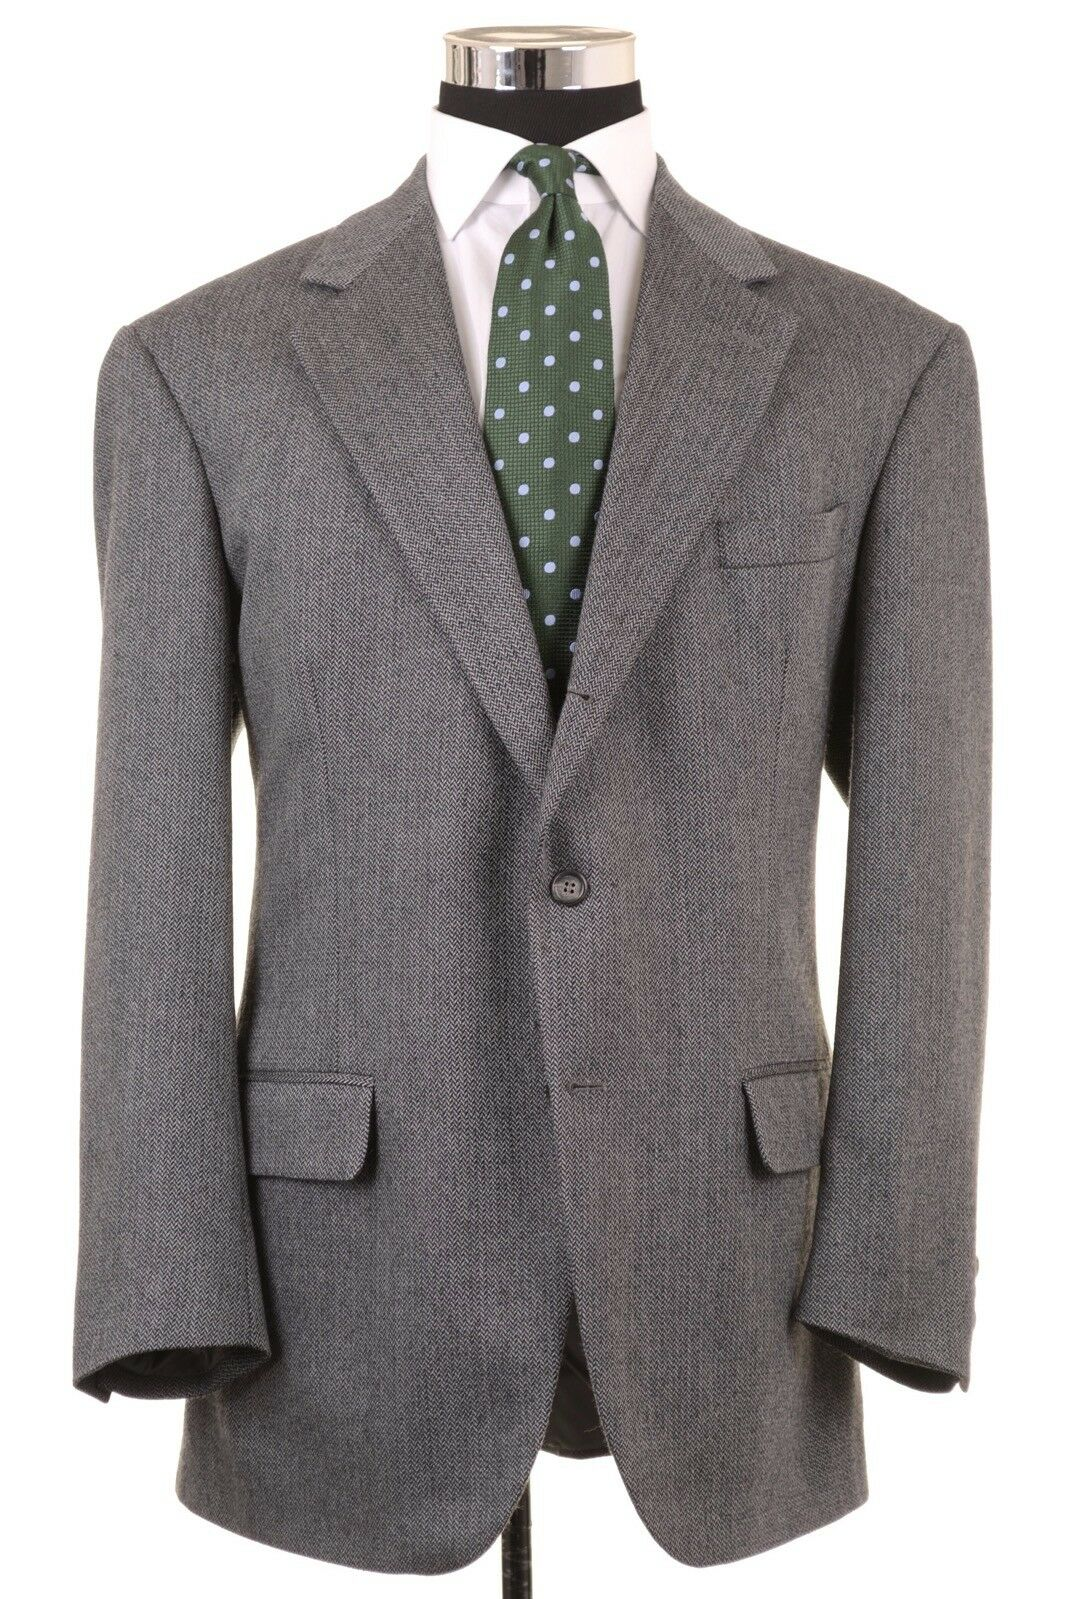 Brooks Brothers grau Herringbone Wool Sport Coat Blazer 44 R